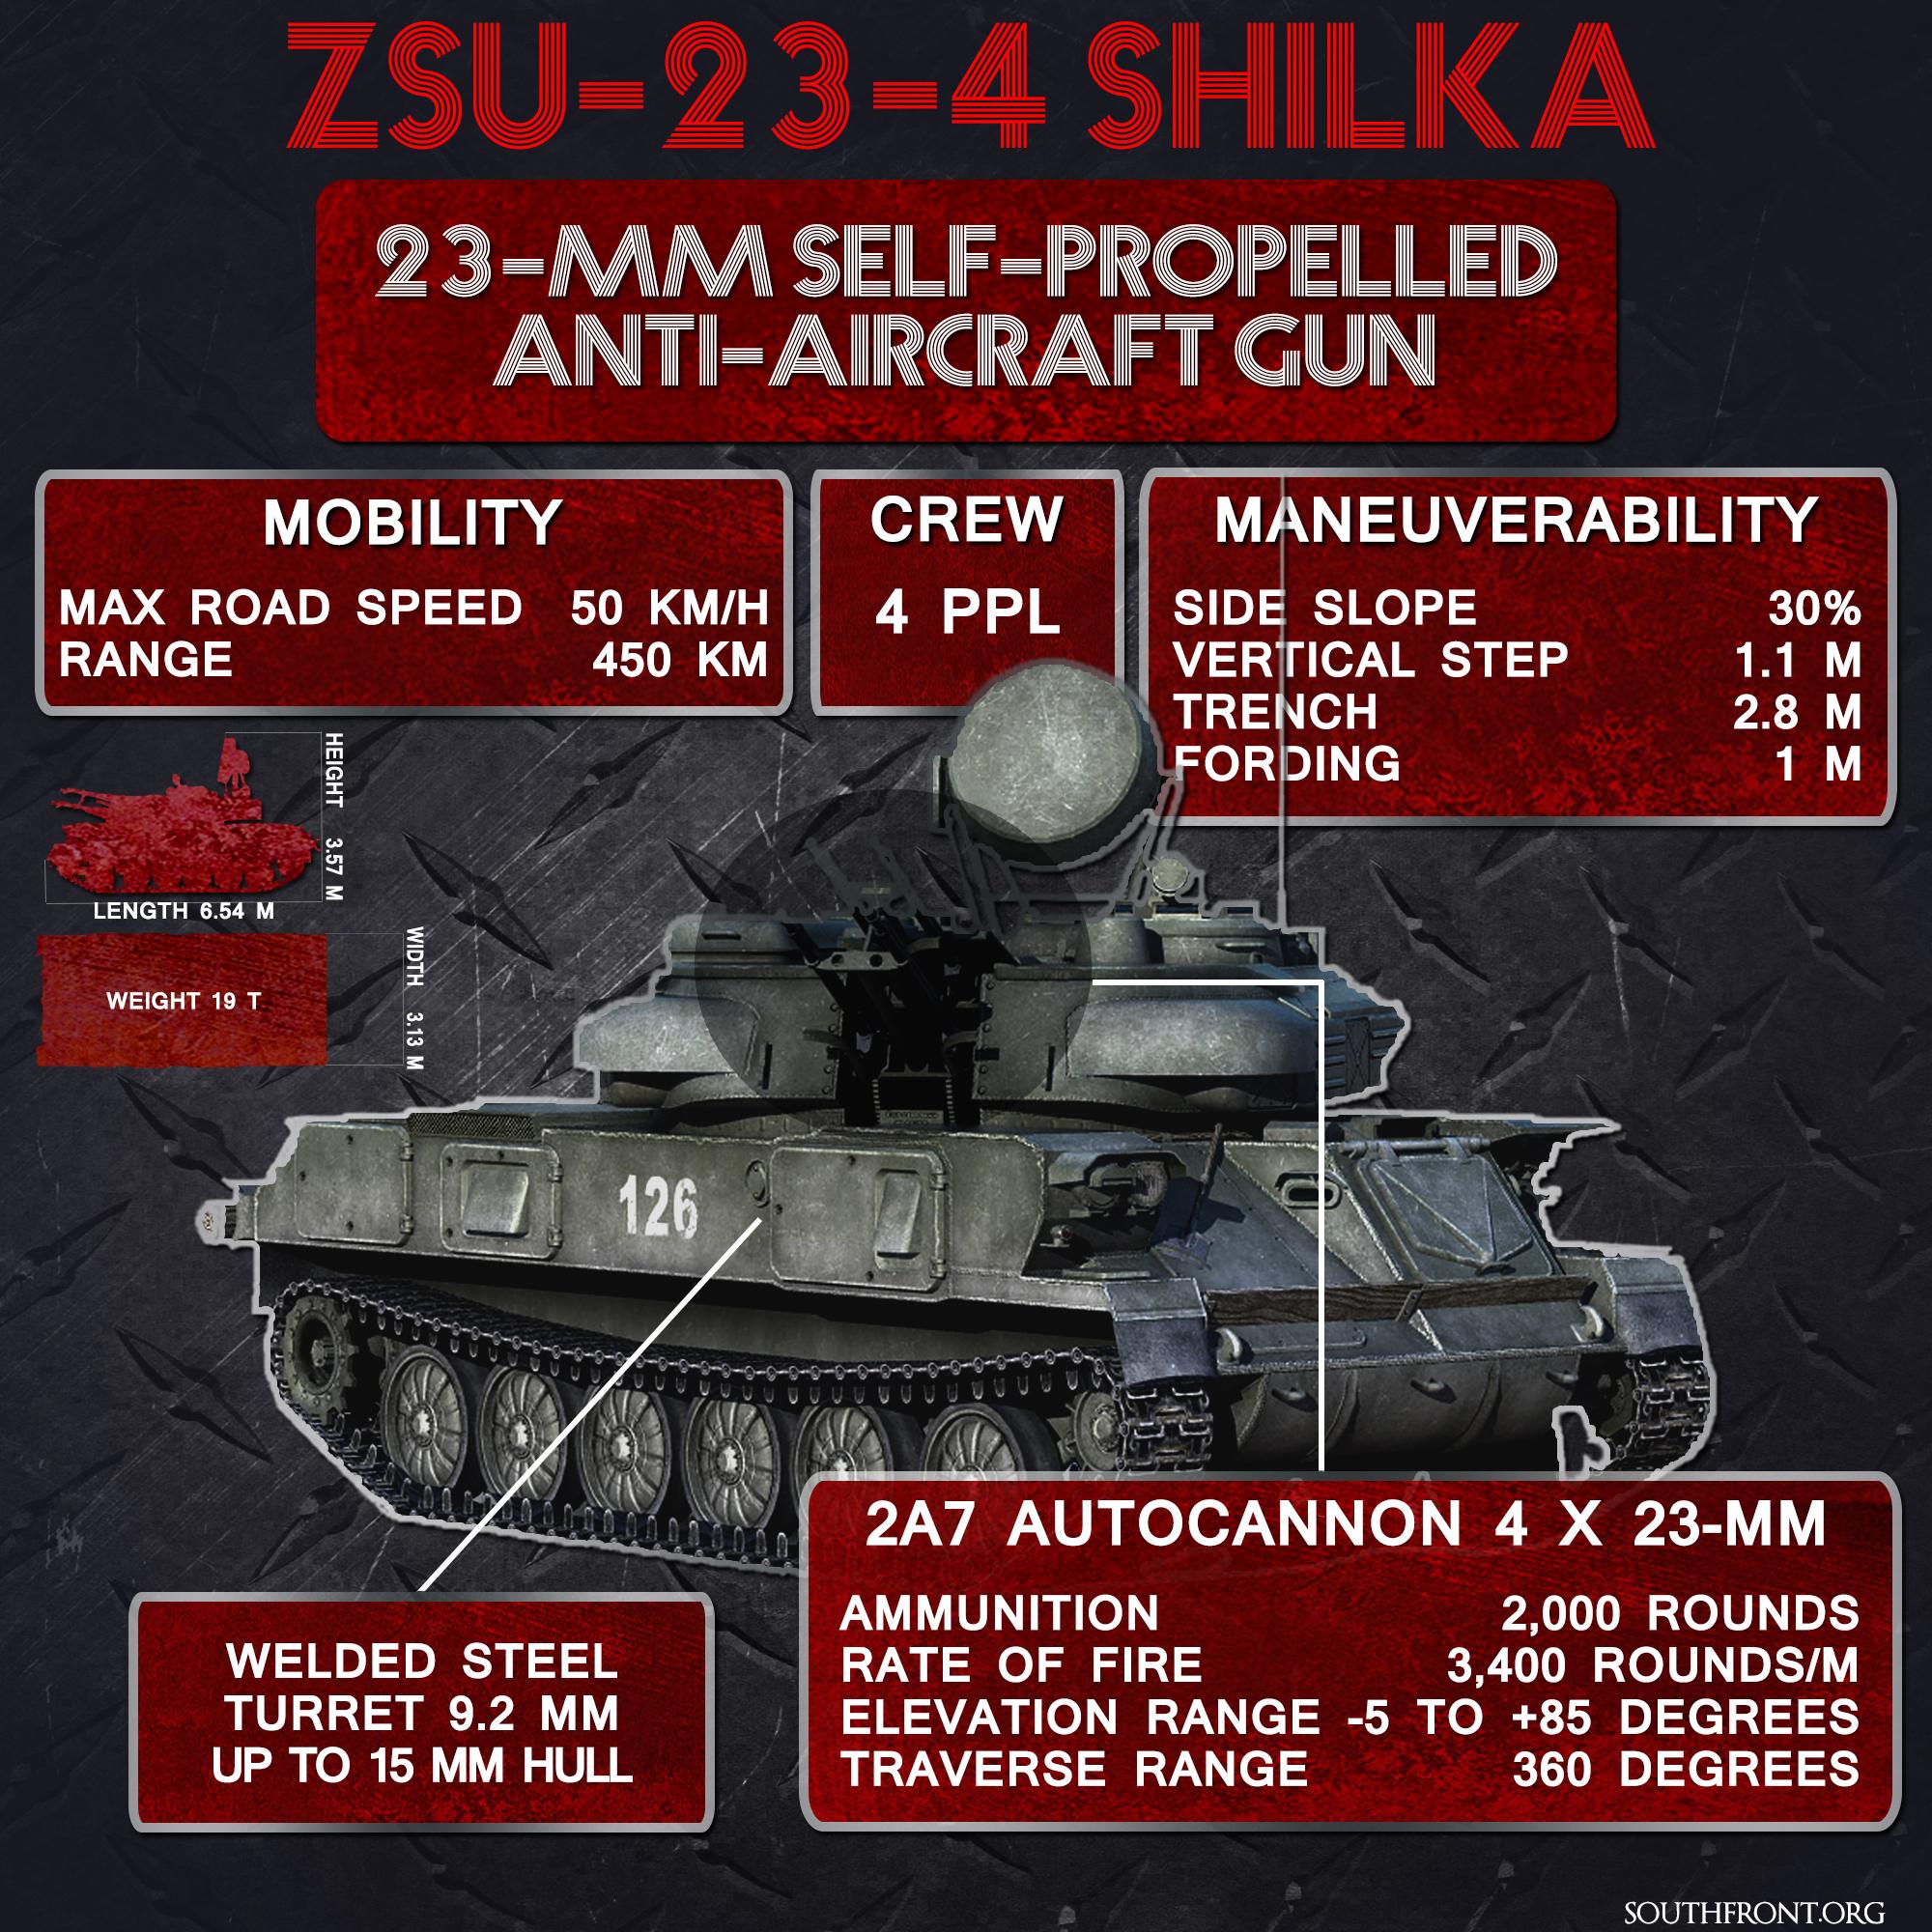 ZSU-23-4 Shilka: Anti-Aircraft Gun for Ground Combat (Infographics)